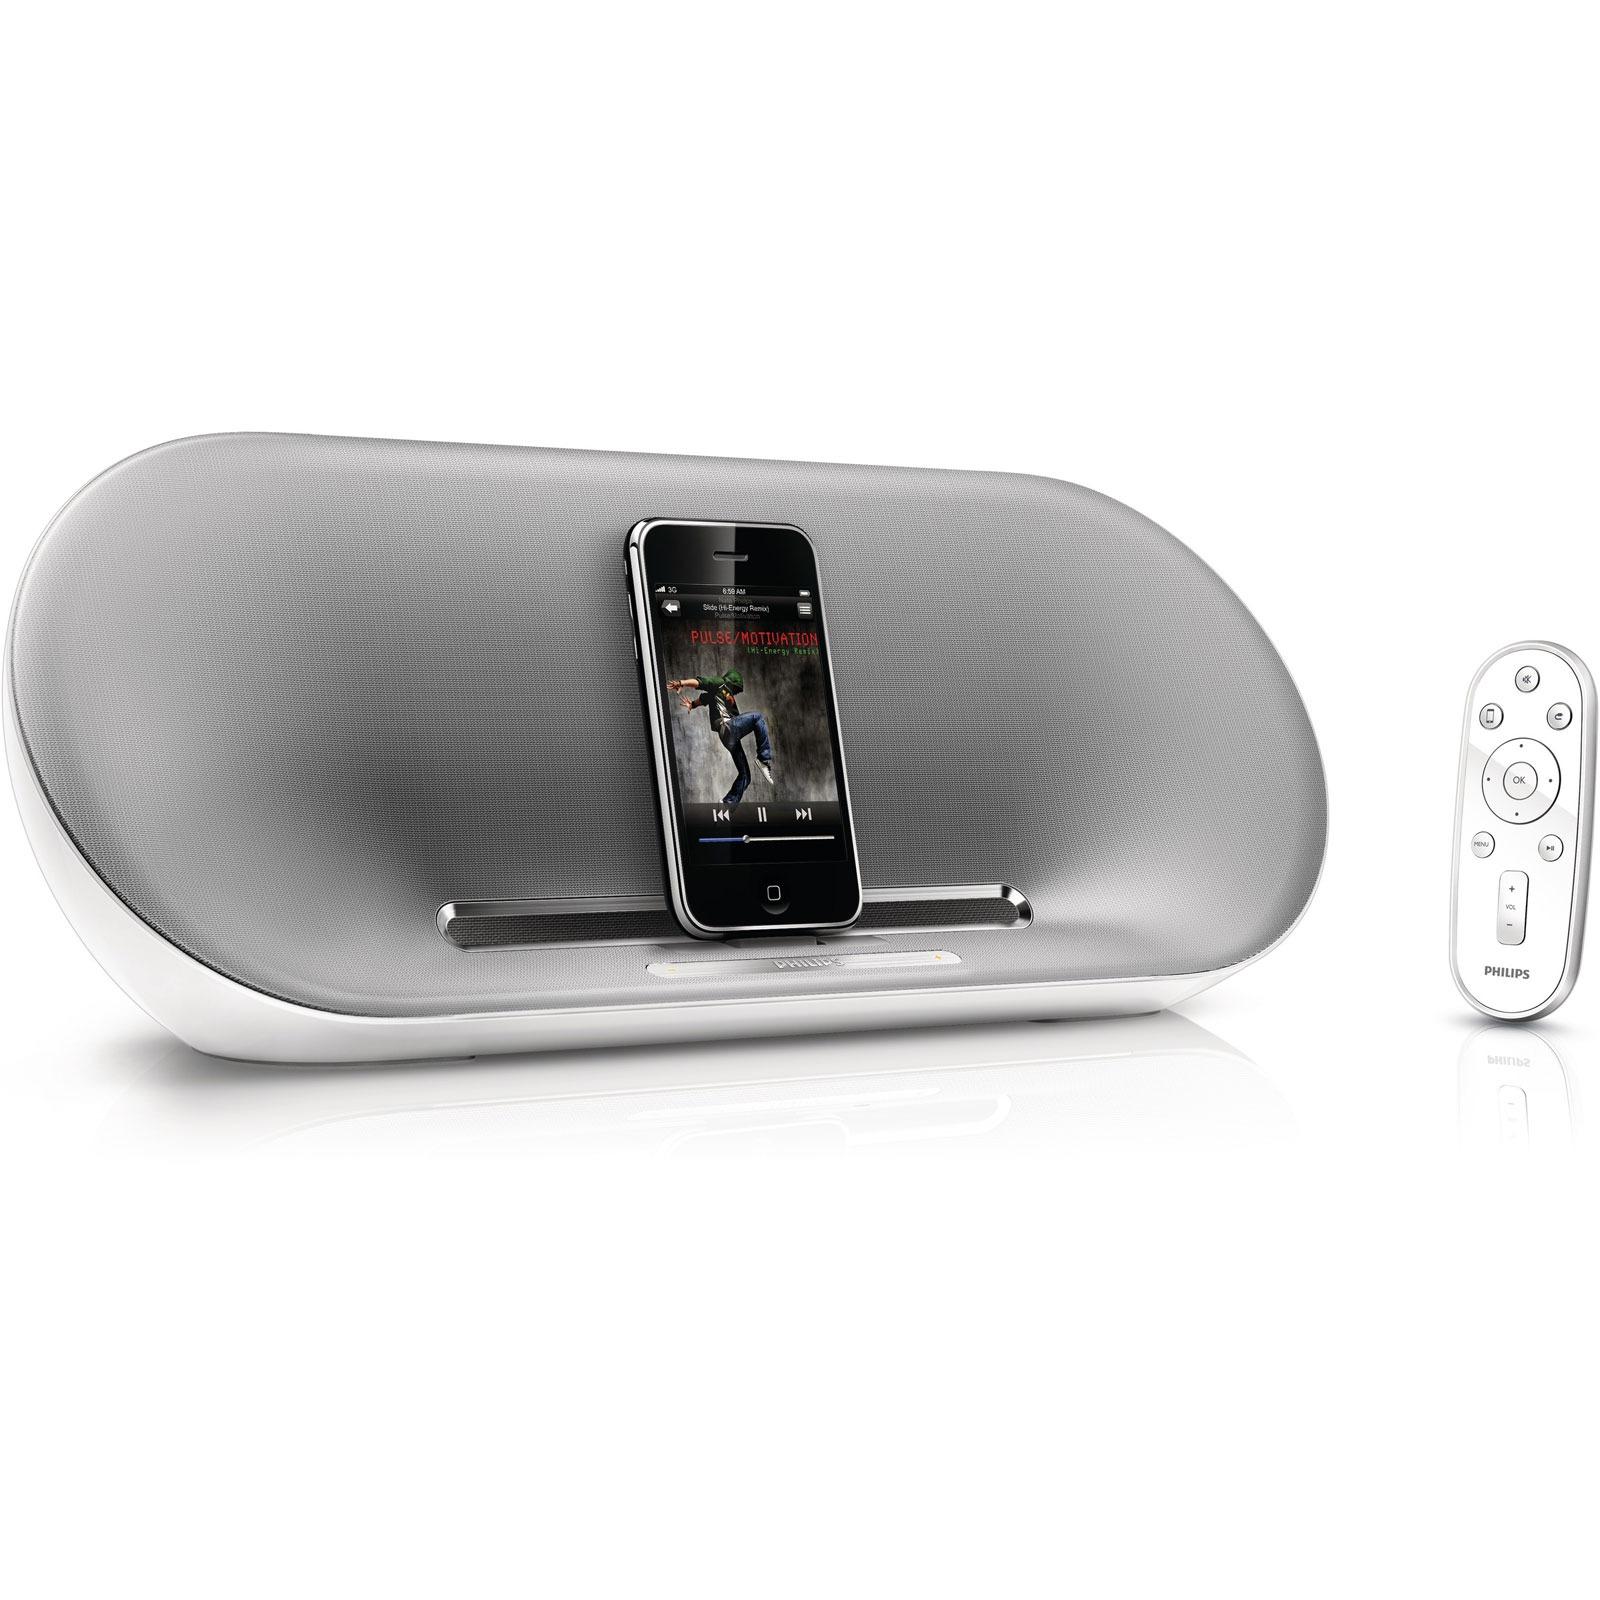 Dock & Enceinte Bluetooth Philips DS8500 Philips DS8500 - Station d'accueil pour iPod/iPhone